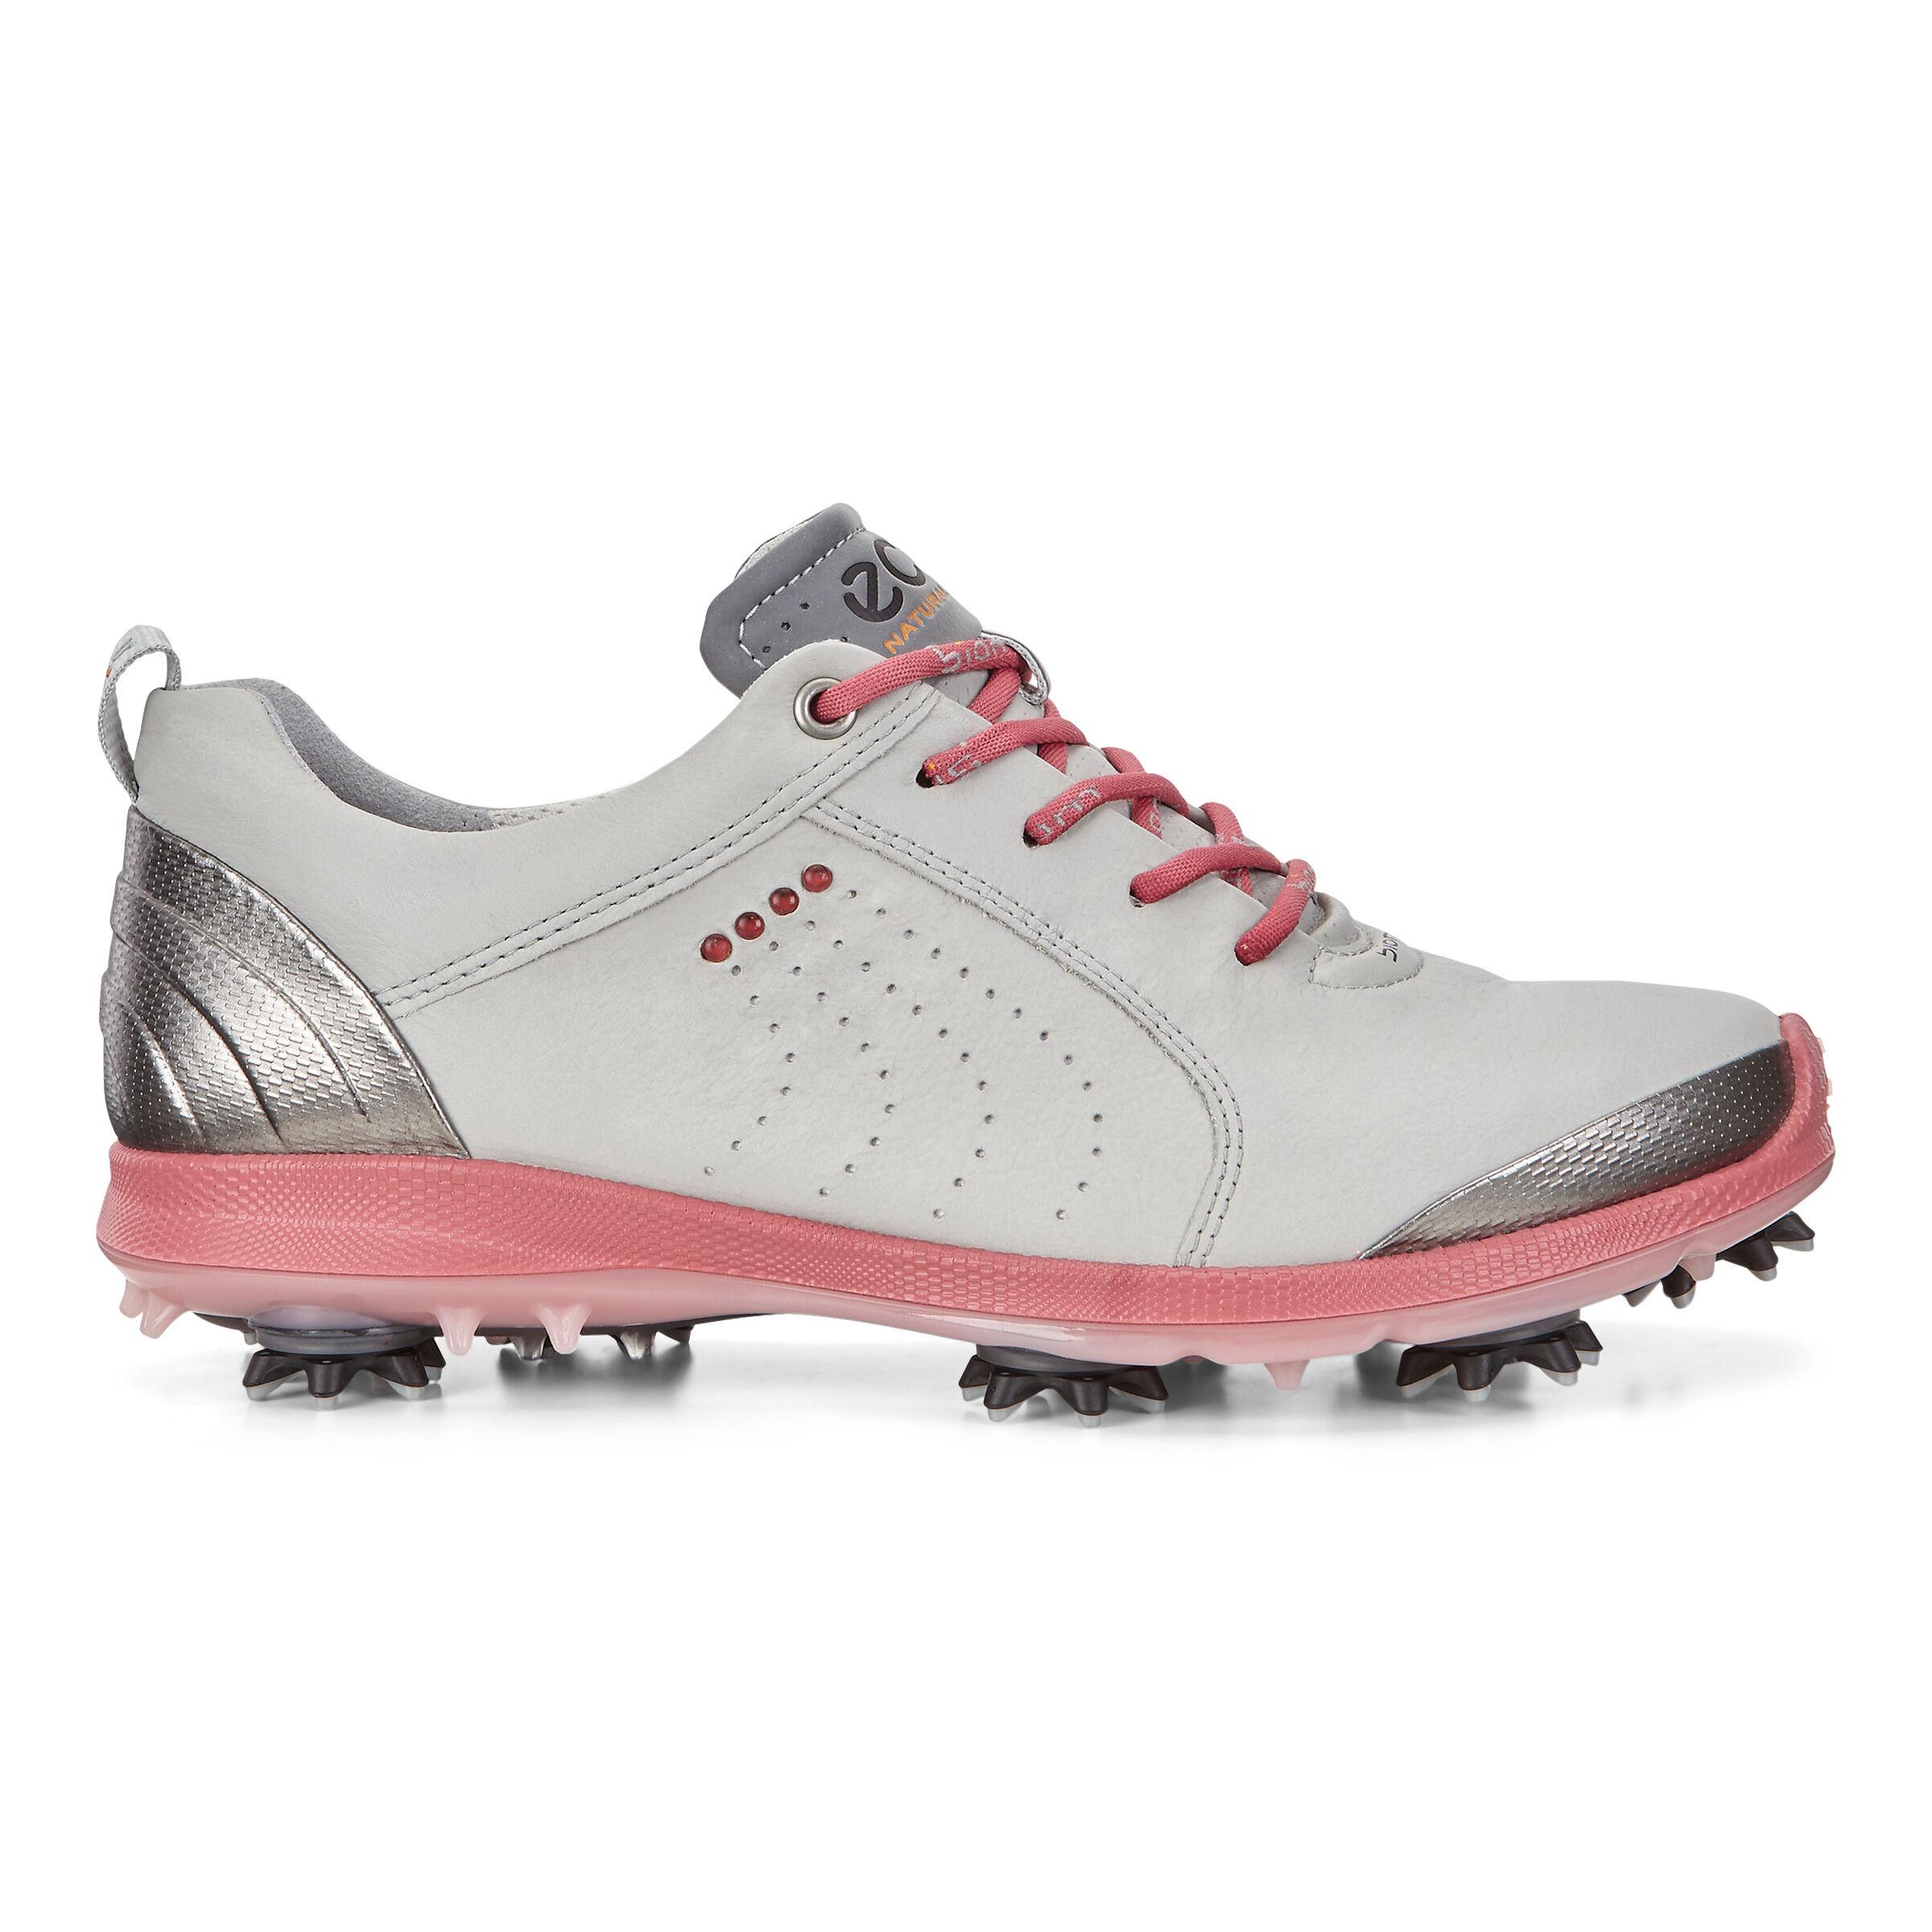 8b90f63905145d Grosses soldes ECCO GOLF BIOM HYBRID 2 Chaussures de golf Homme gris ... chaussures  golf ecco soldes